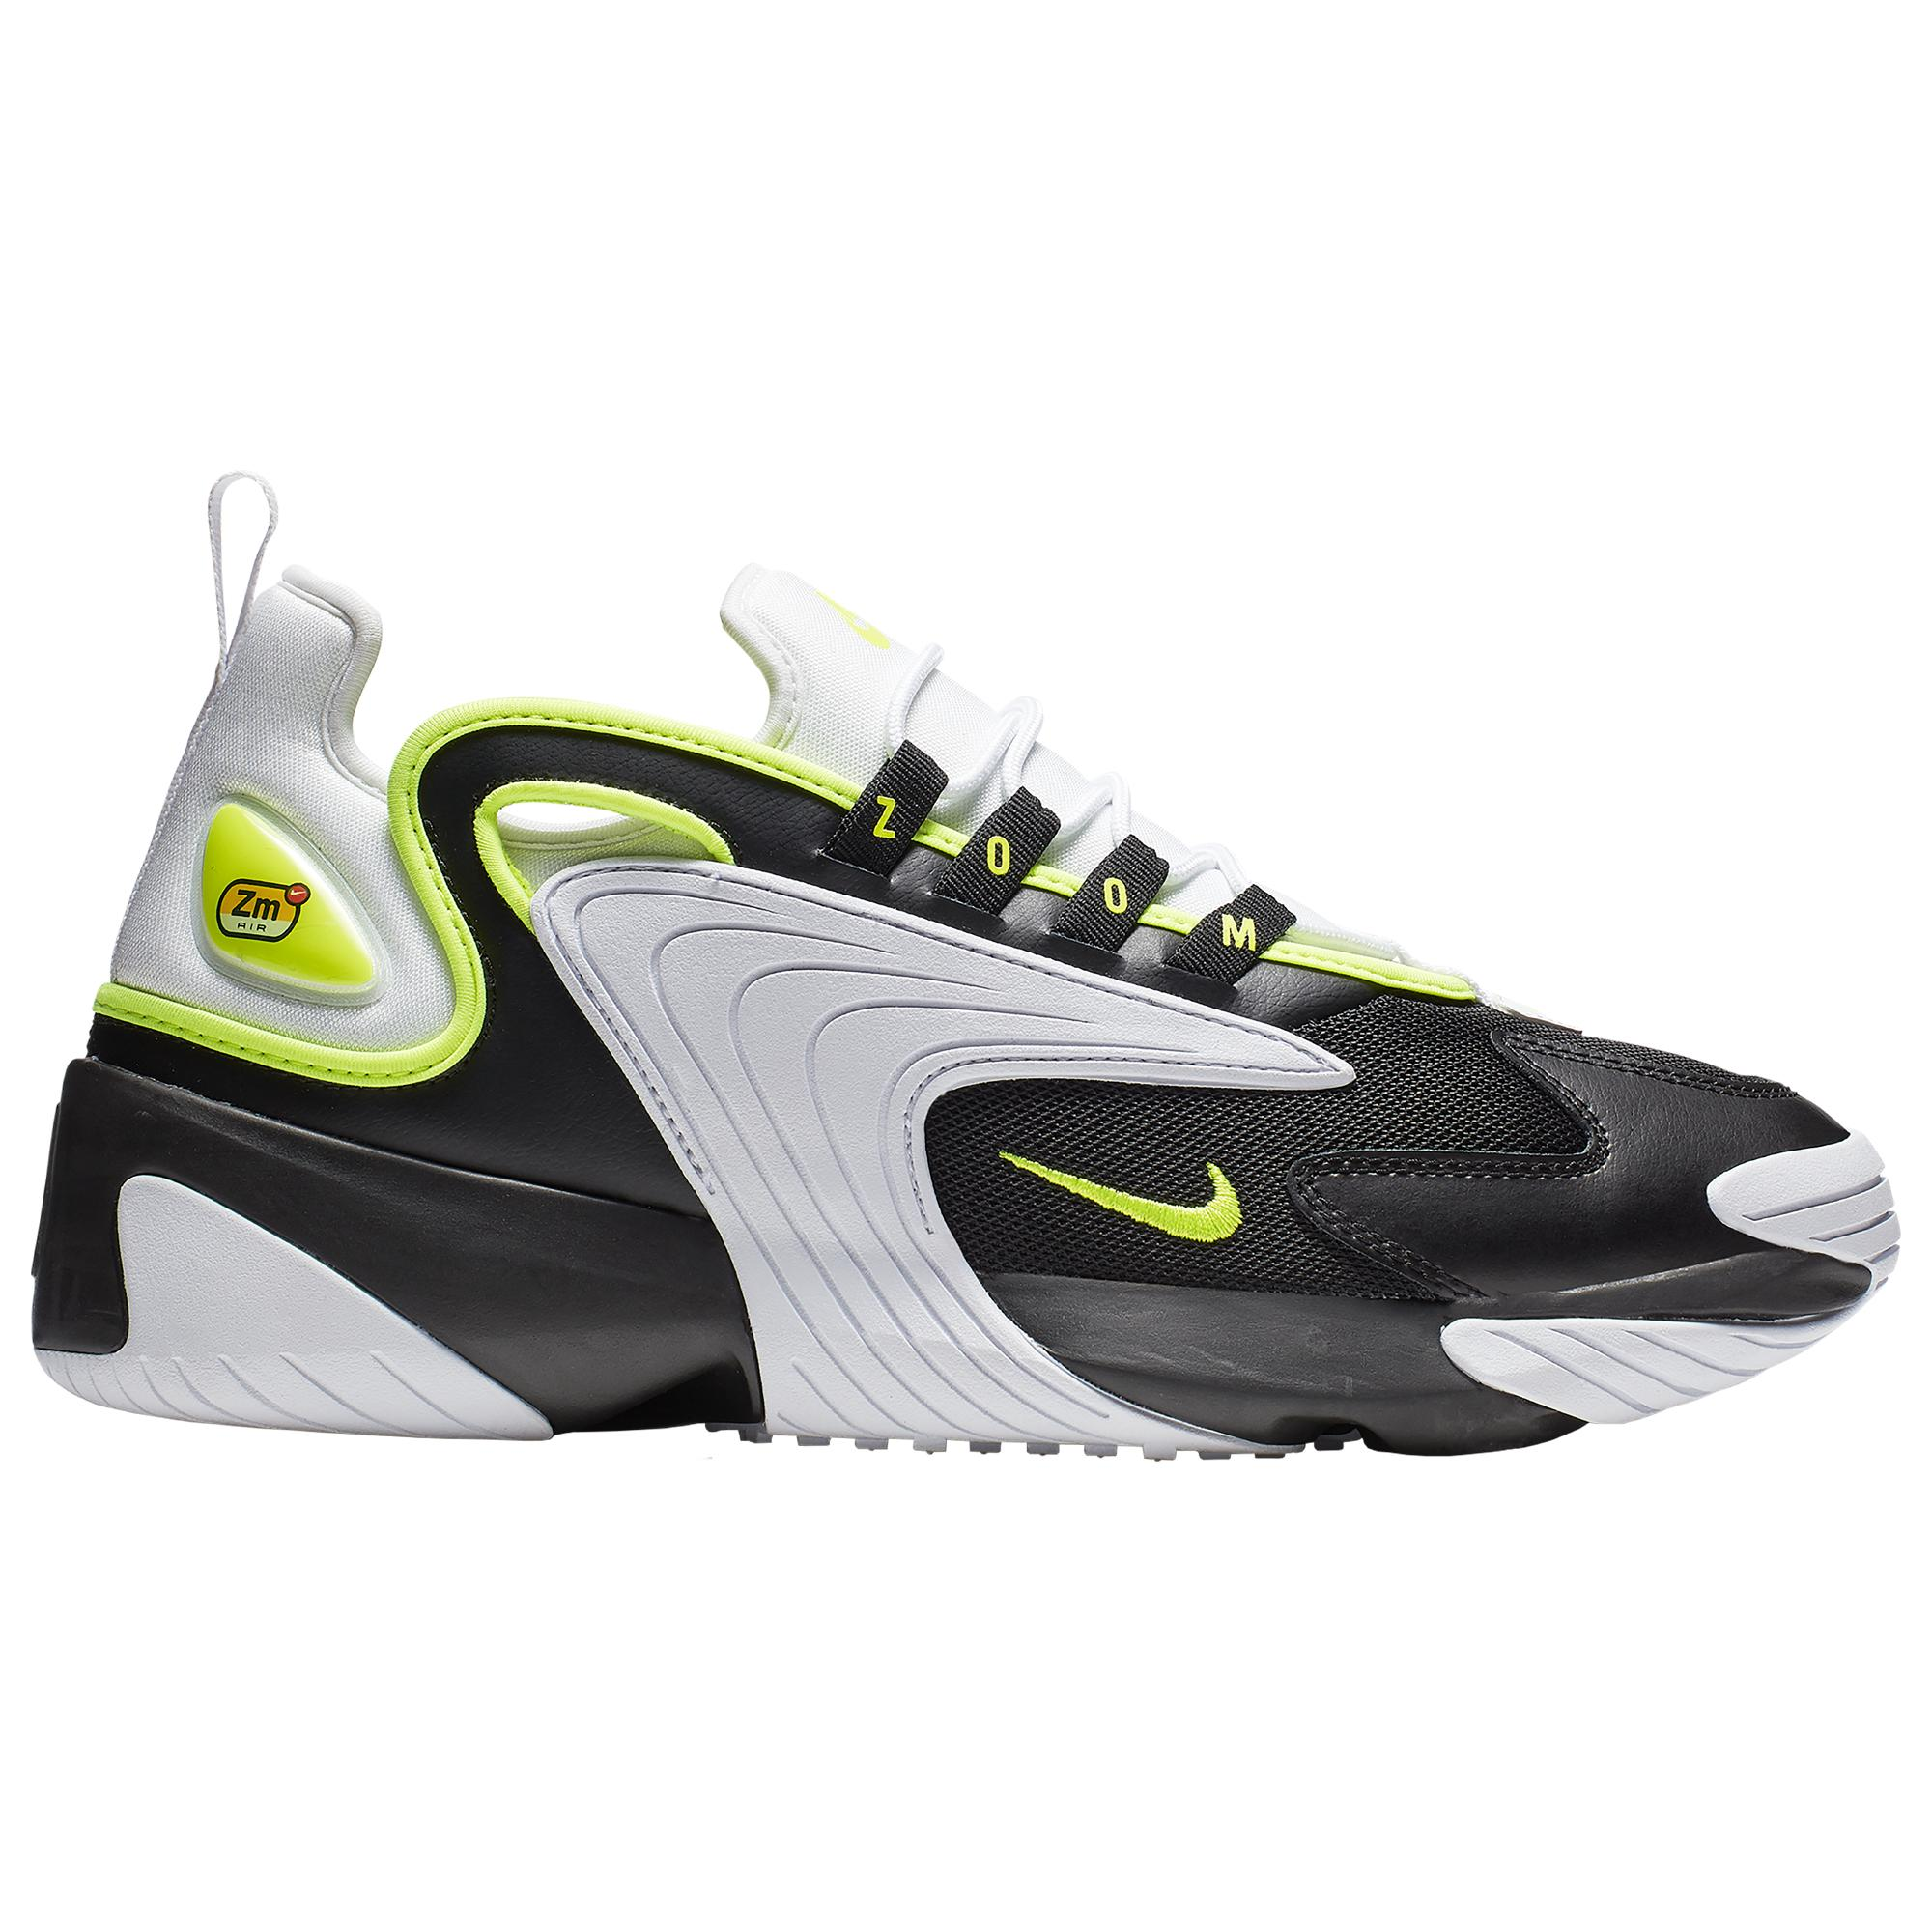 Cusco Estallar manguera  Nike Rubber Zoom 2k Running Shoes in Black for Men - Save 48% - Lyst